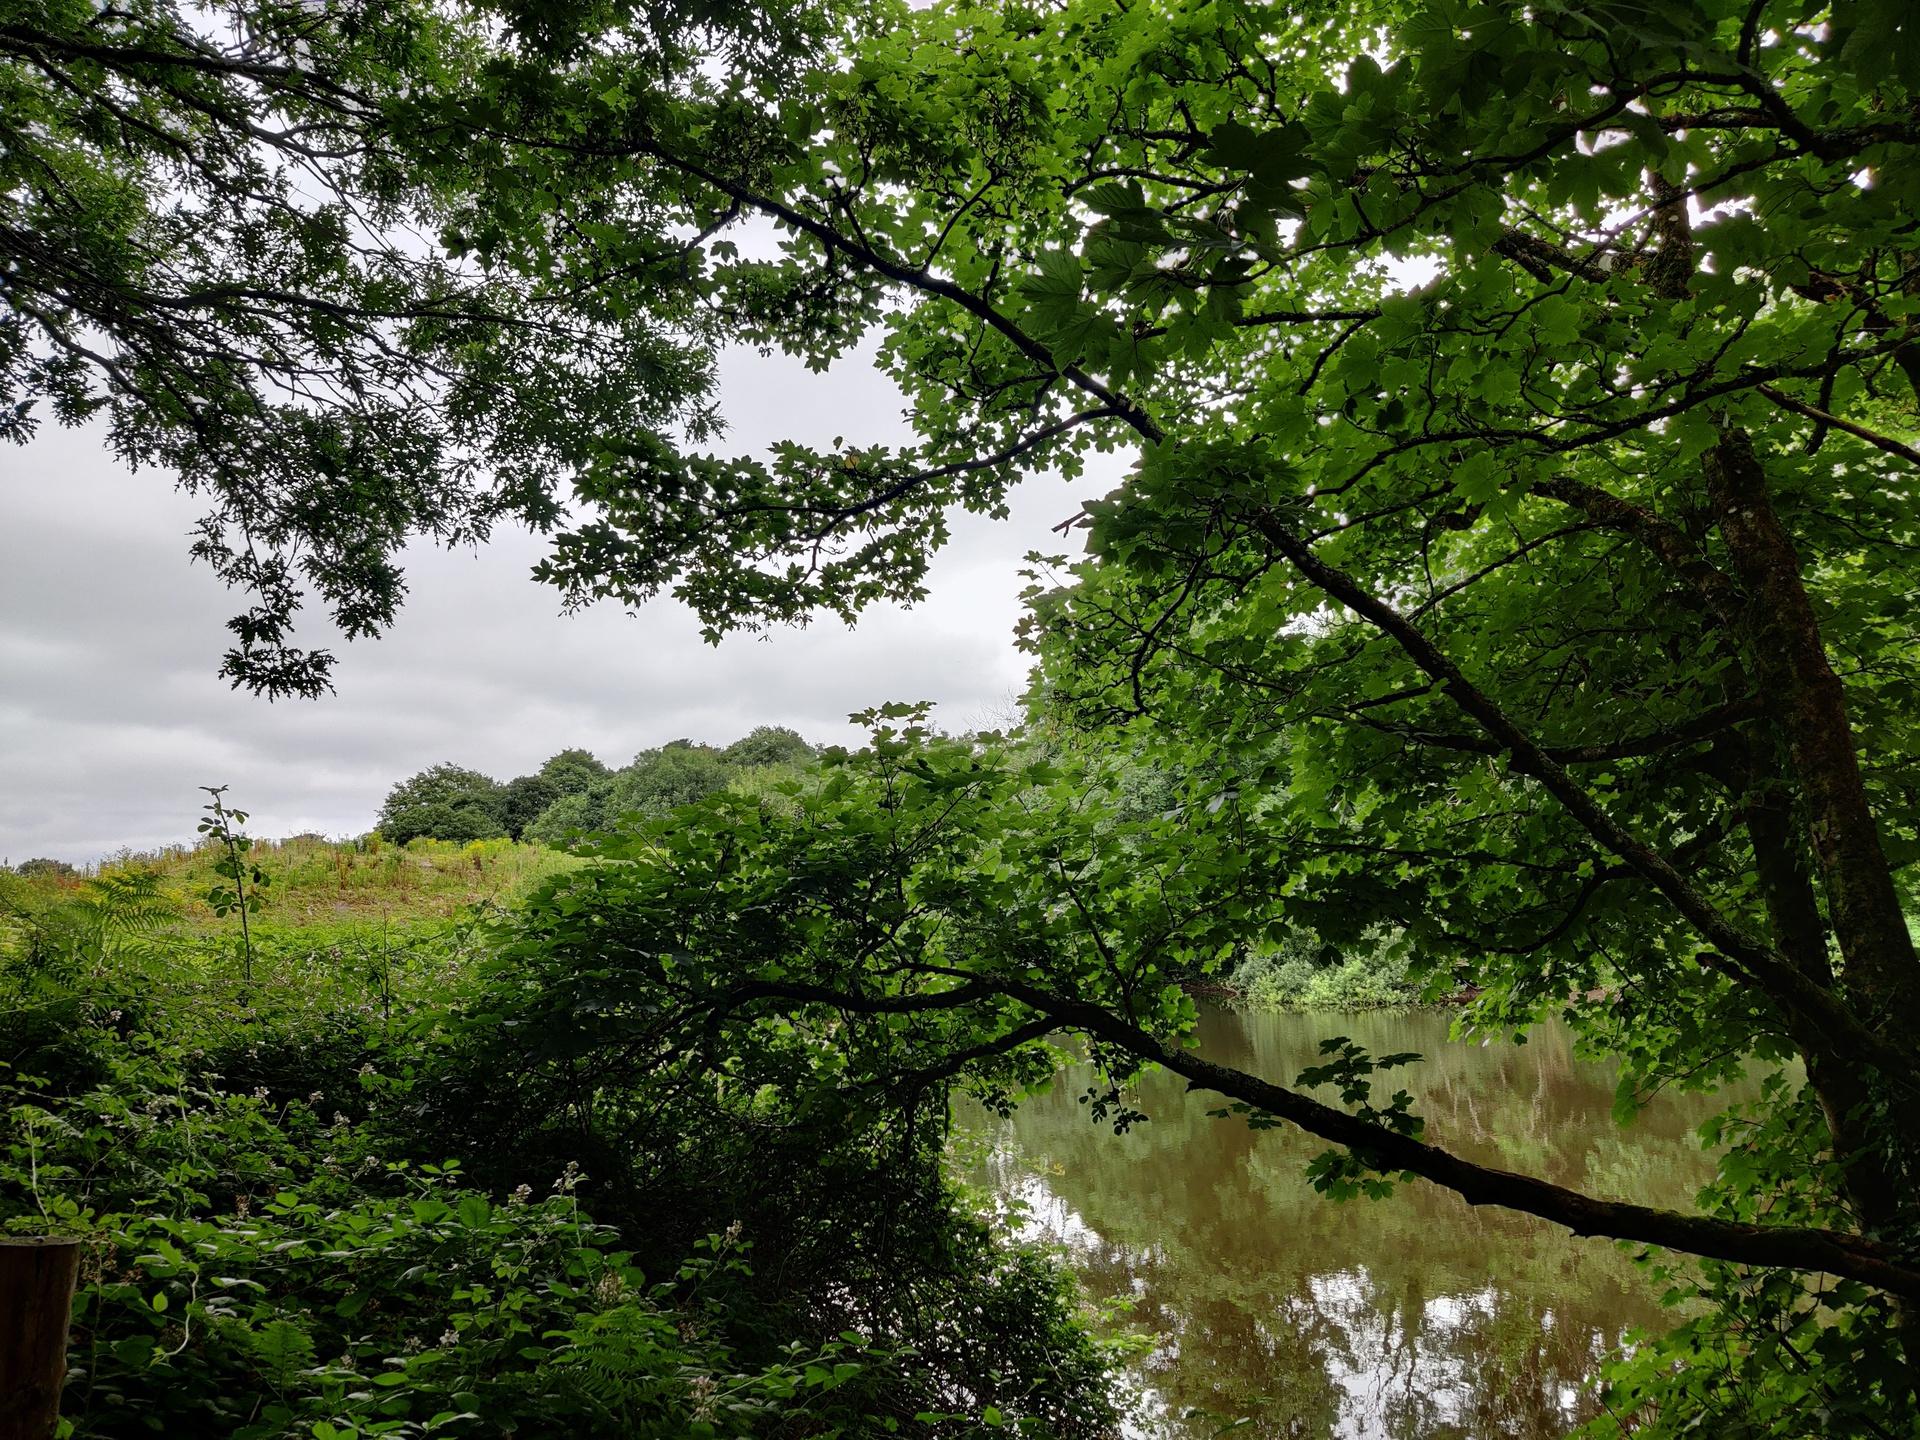 OnePlus Nord test image main camera shot under trees